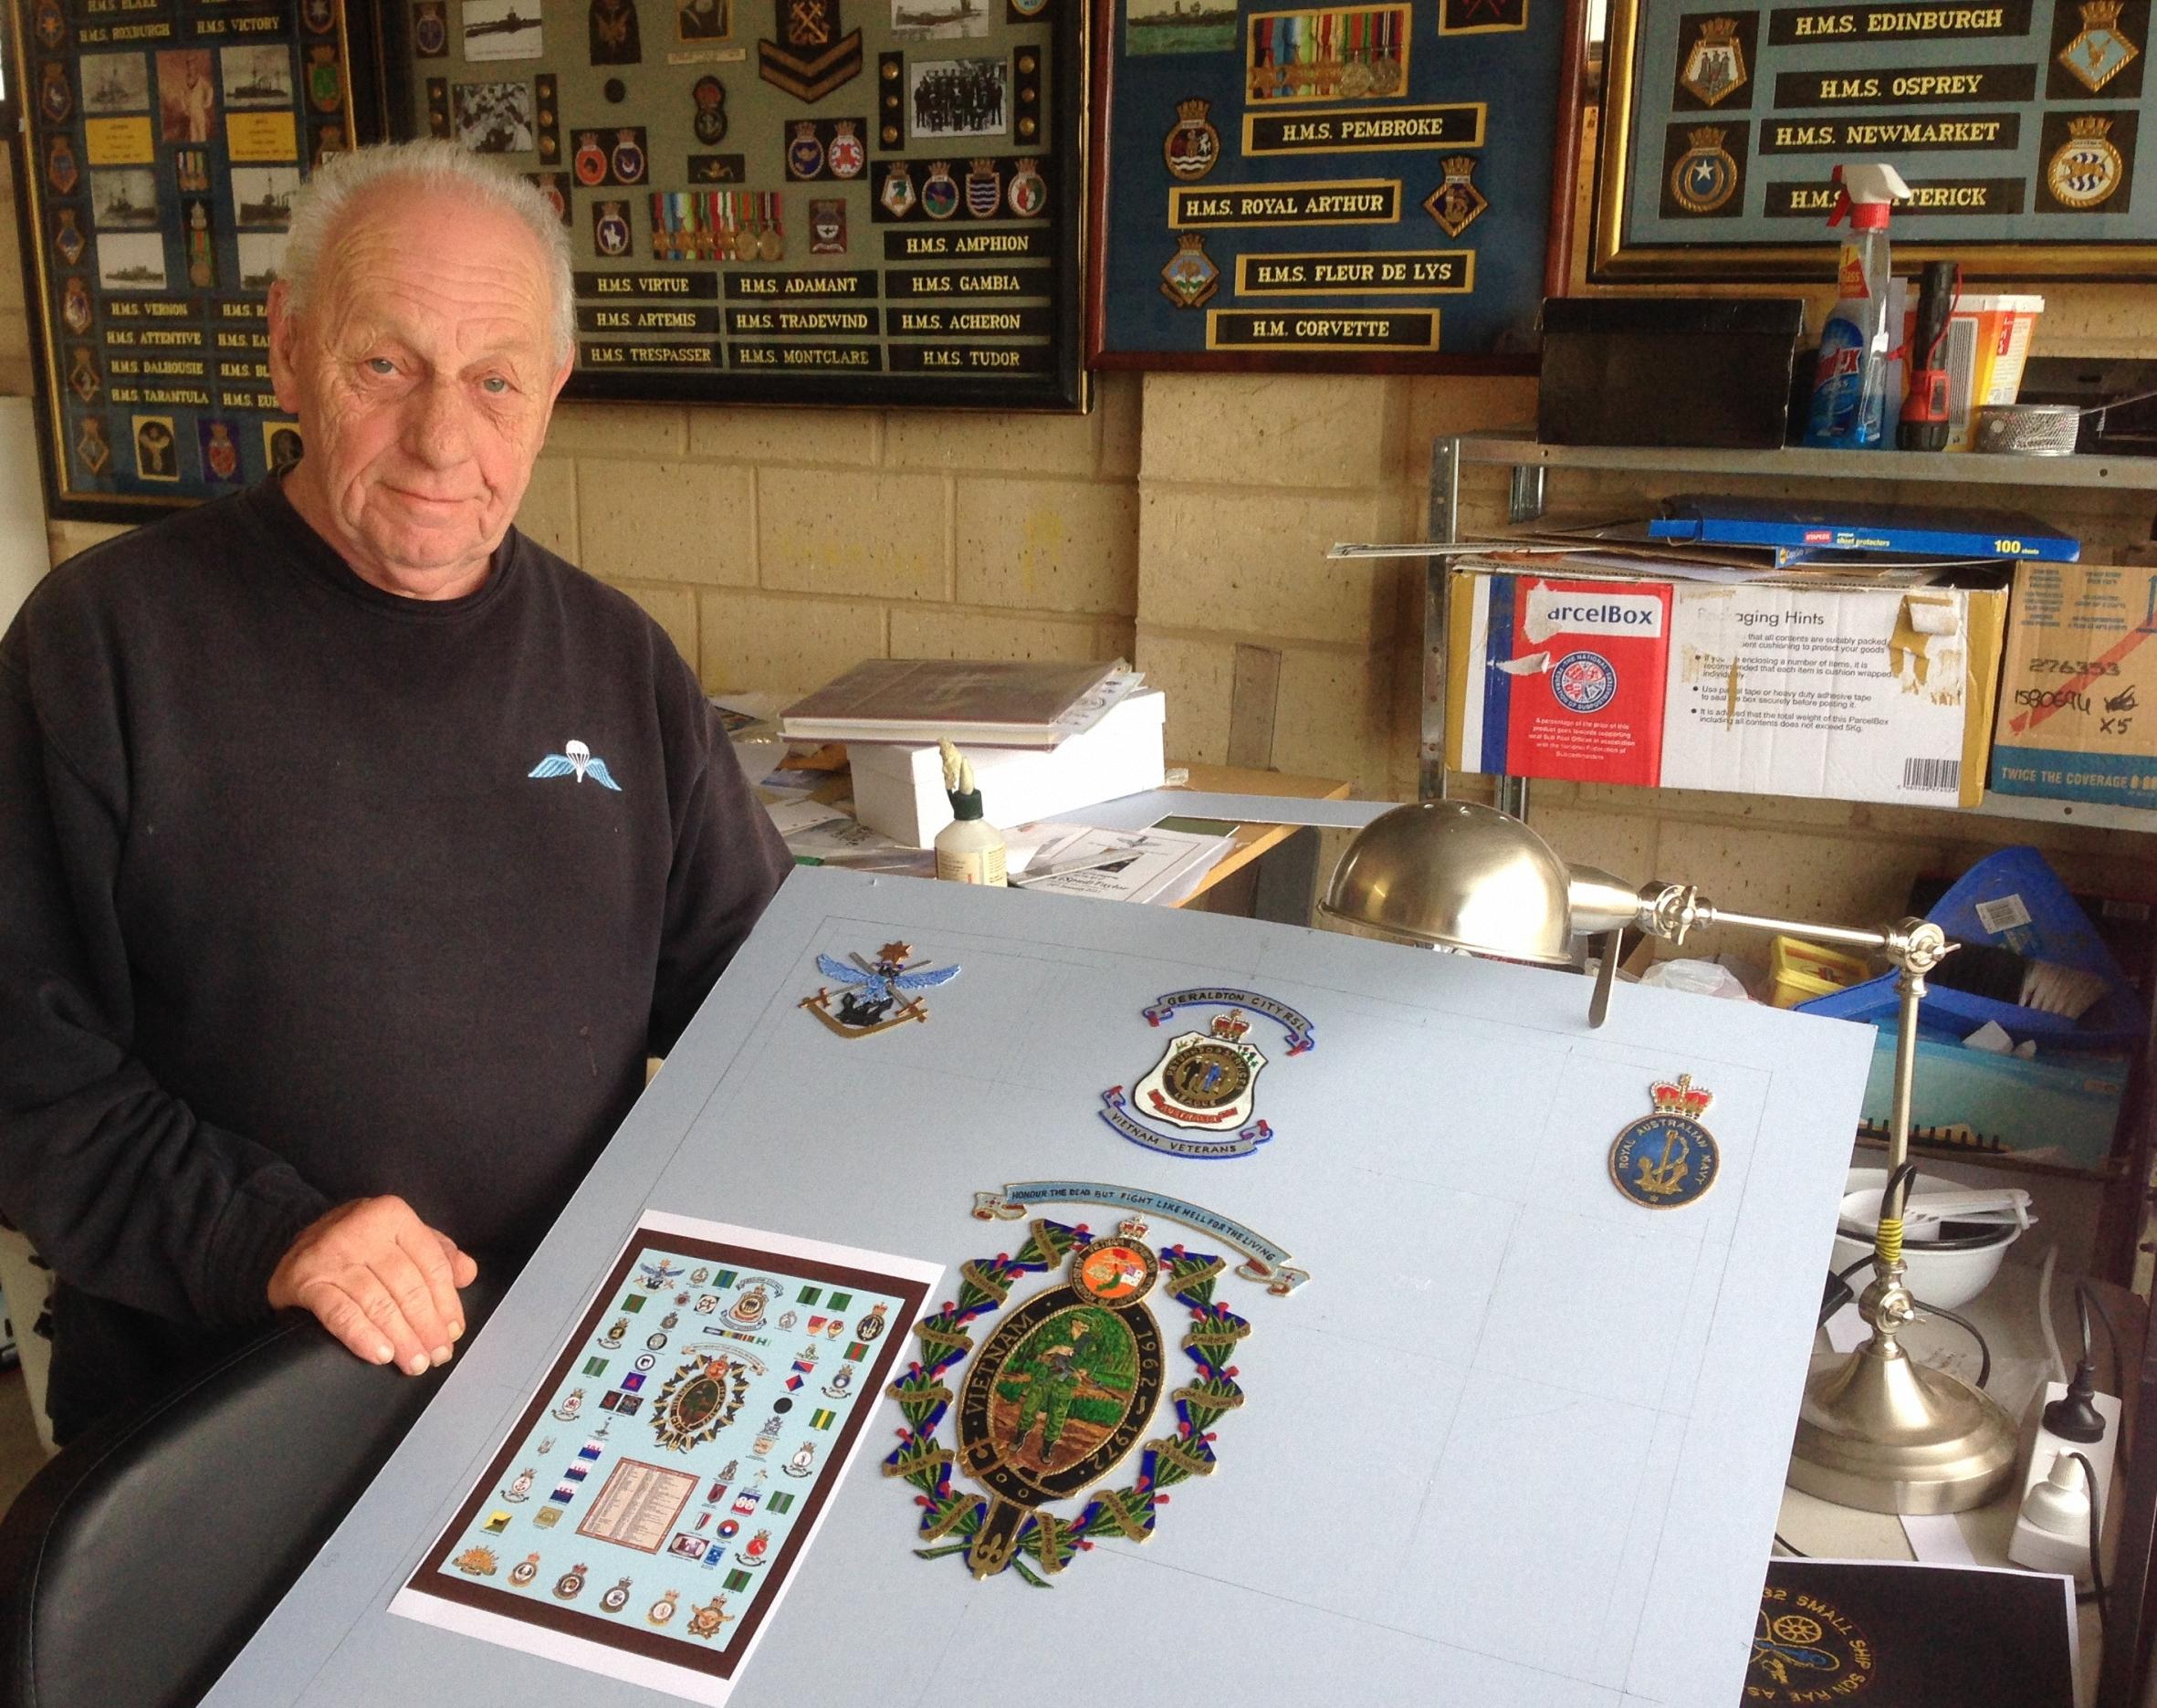 David Burns in his studio, where he creates artistic tributes to the Military.